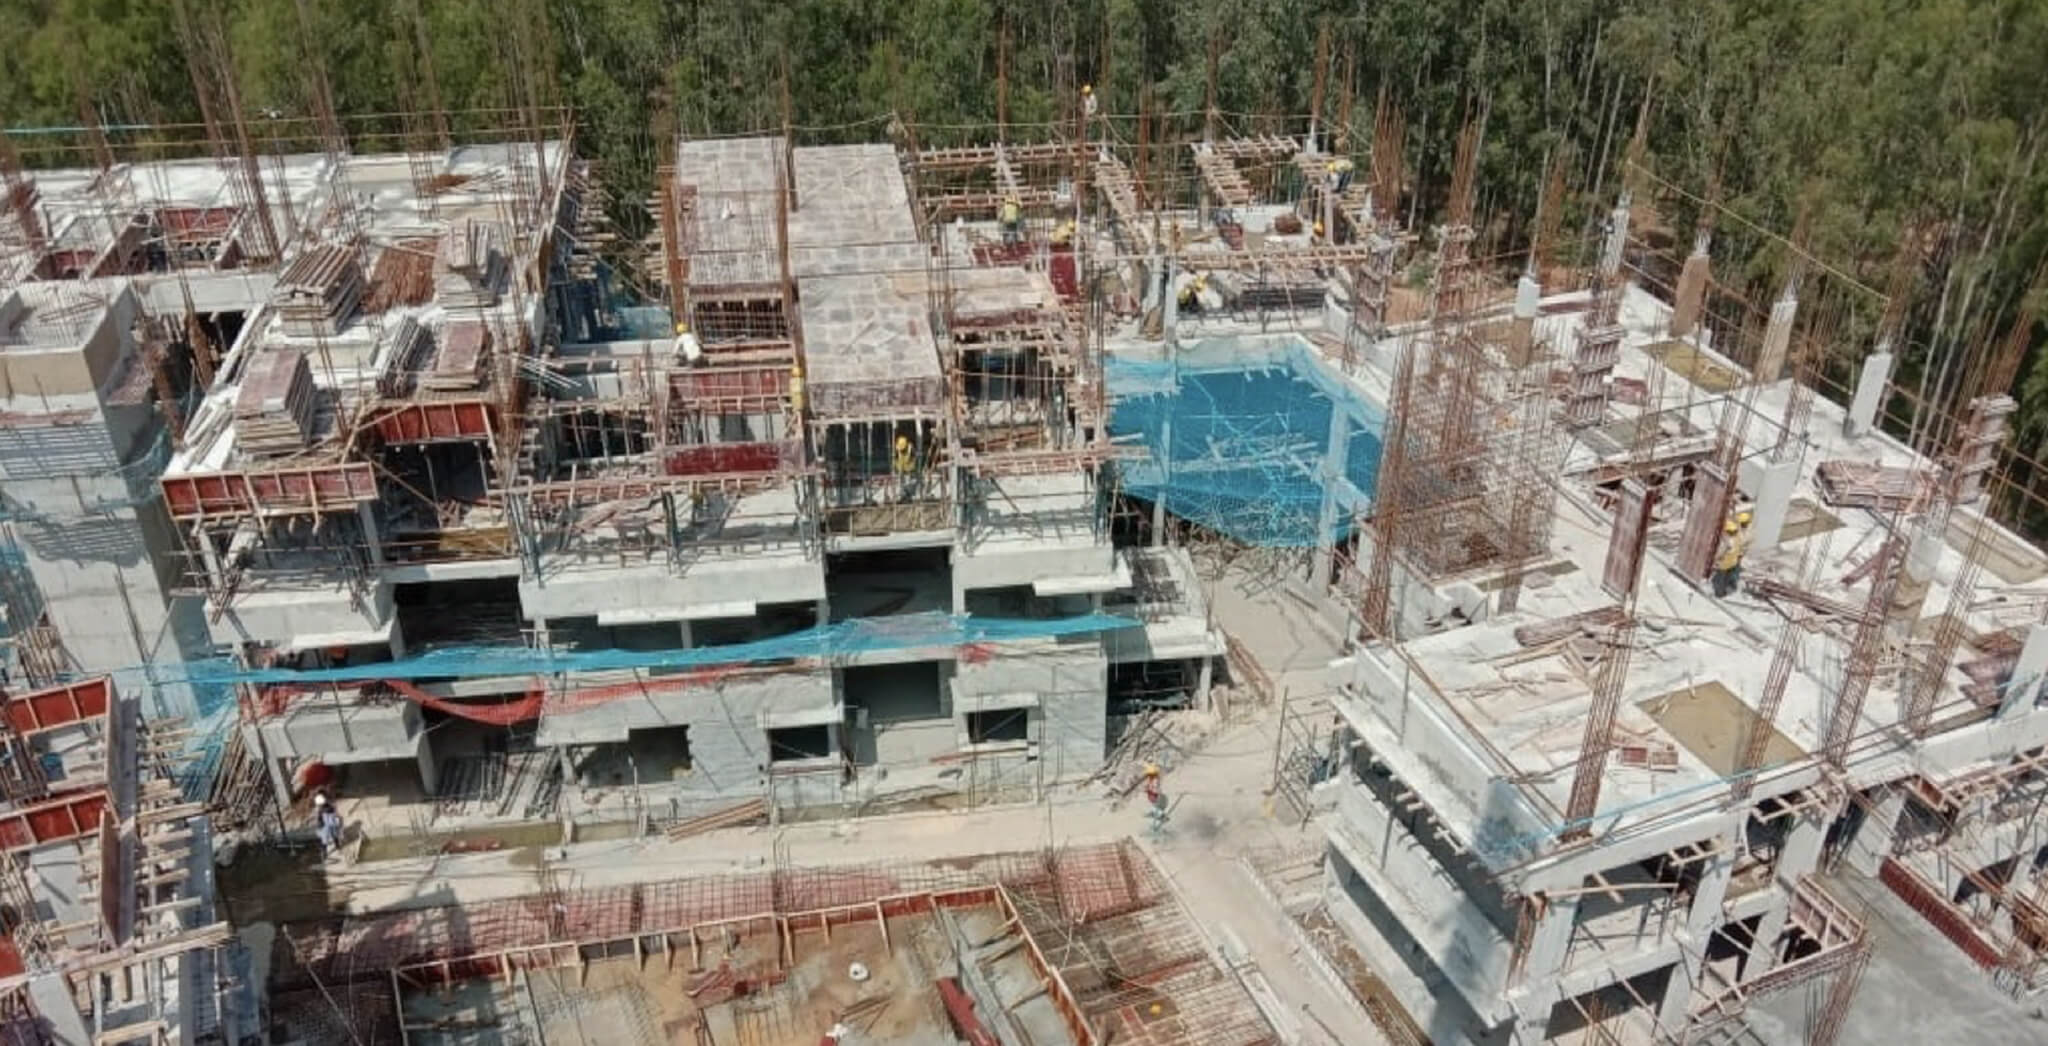 Nov 2019 - West side view: L Block—Third floor slab completed; M Block—Third floor shuttering work-in-progress; N Block—Second floor slab completed, columns work-in-progress